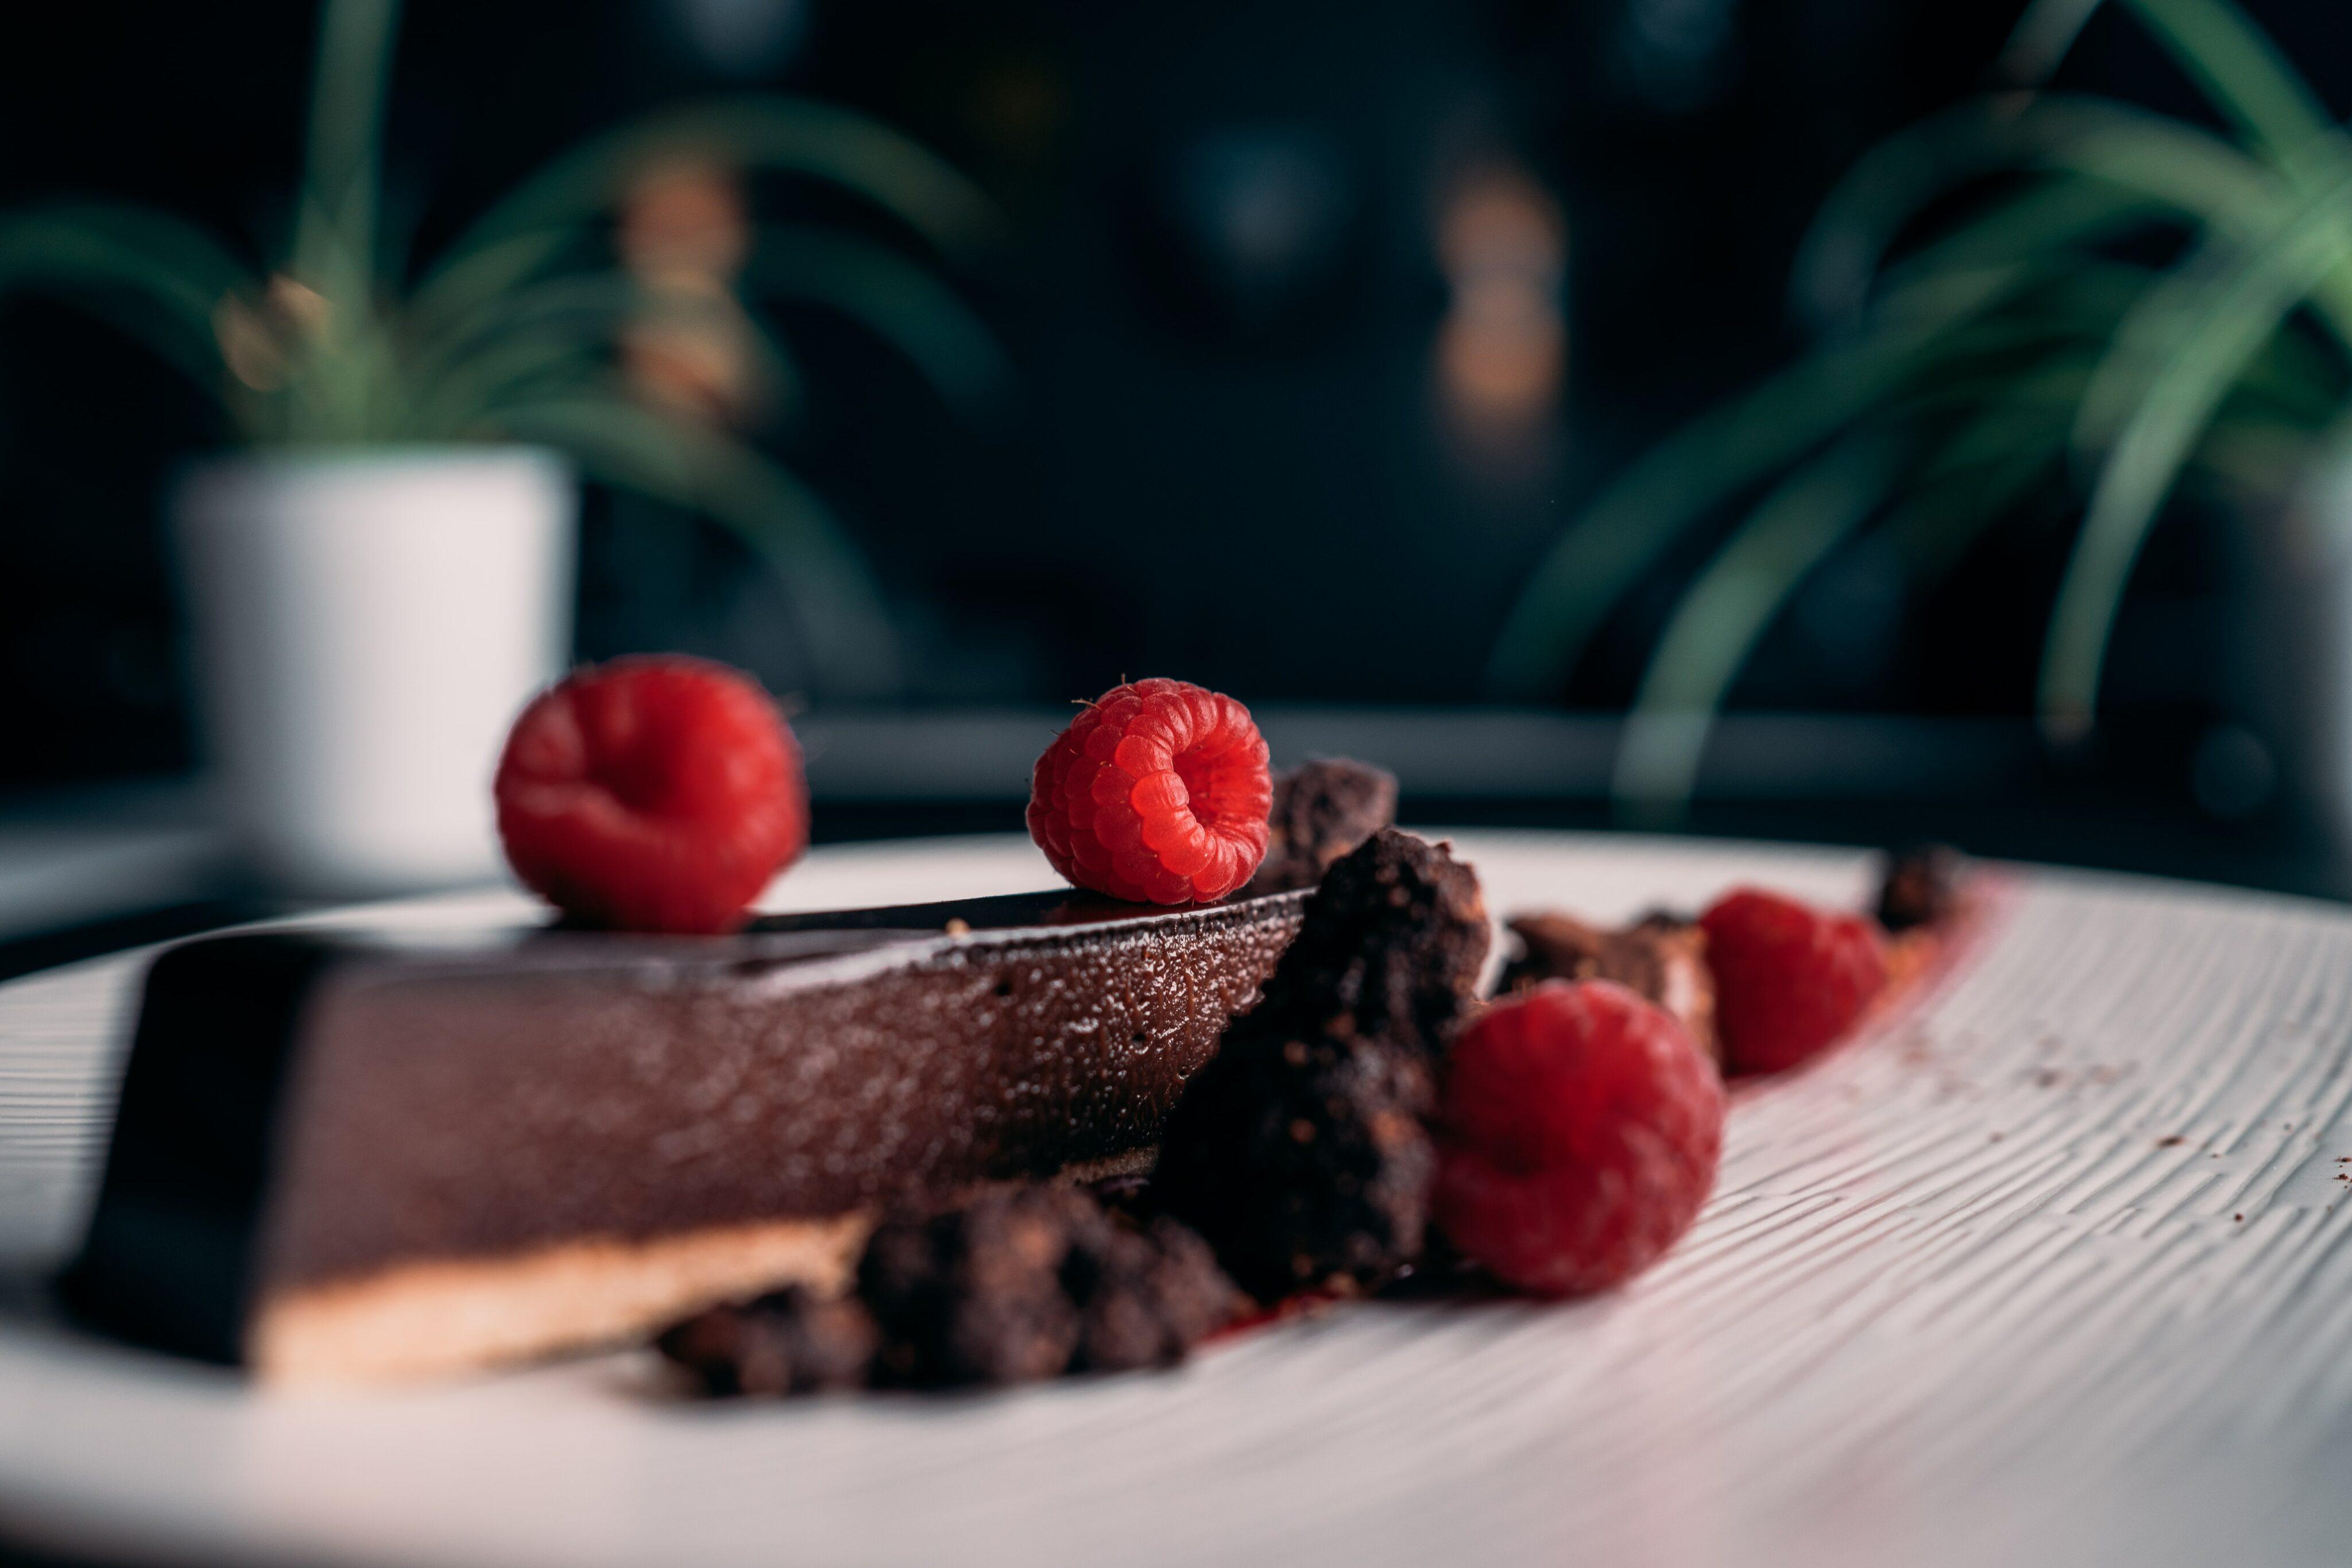 l'entremet chocolat du cheverny